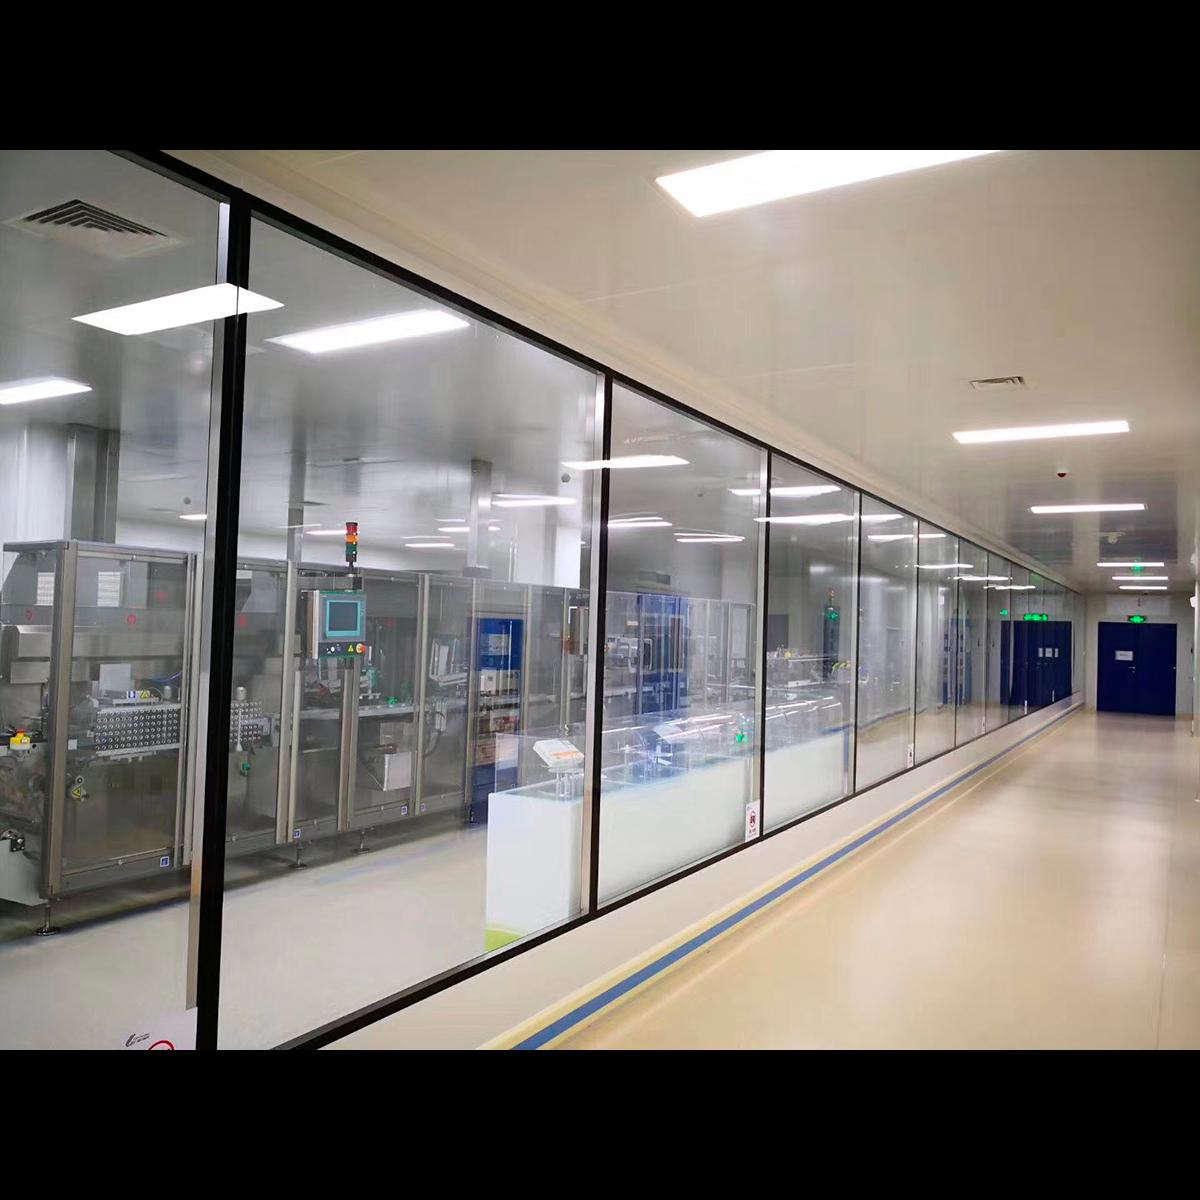 Laboratory windows